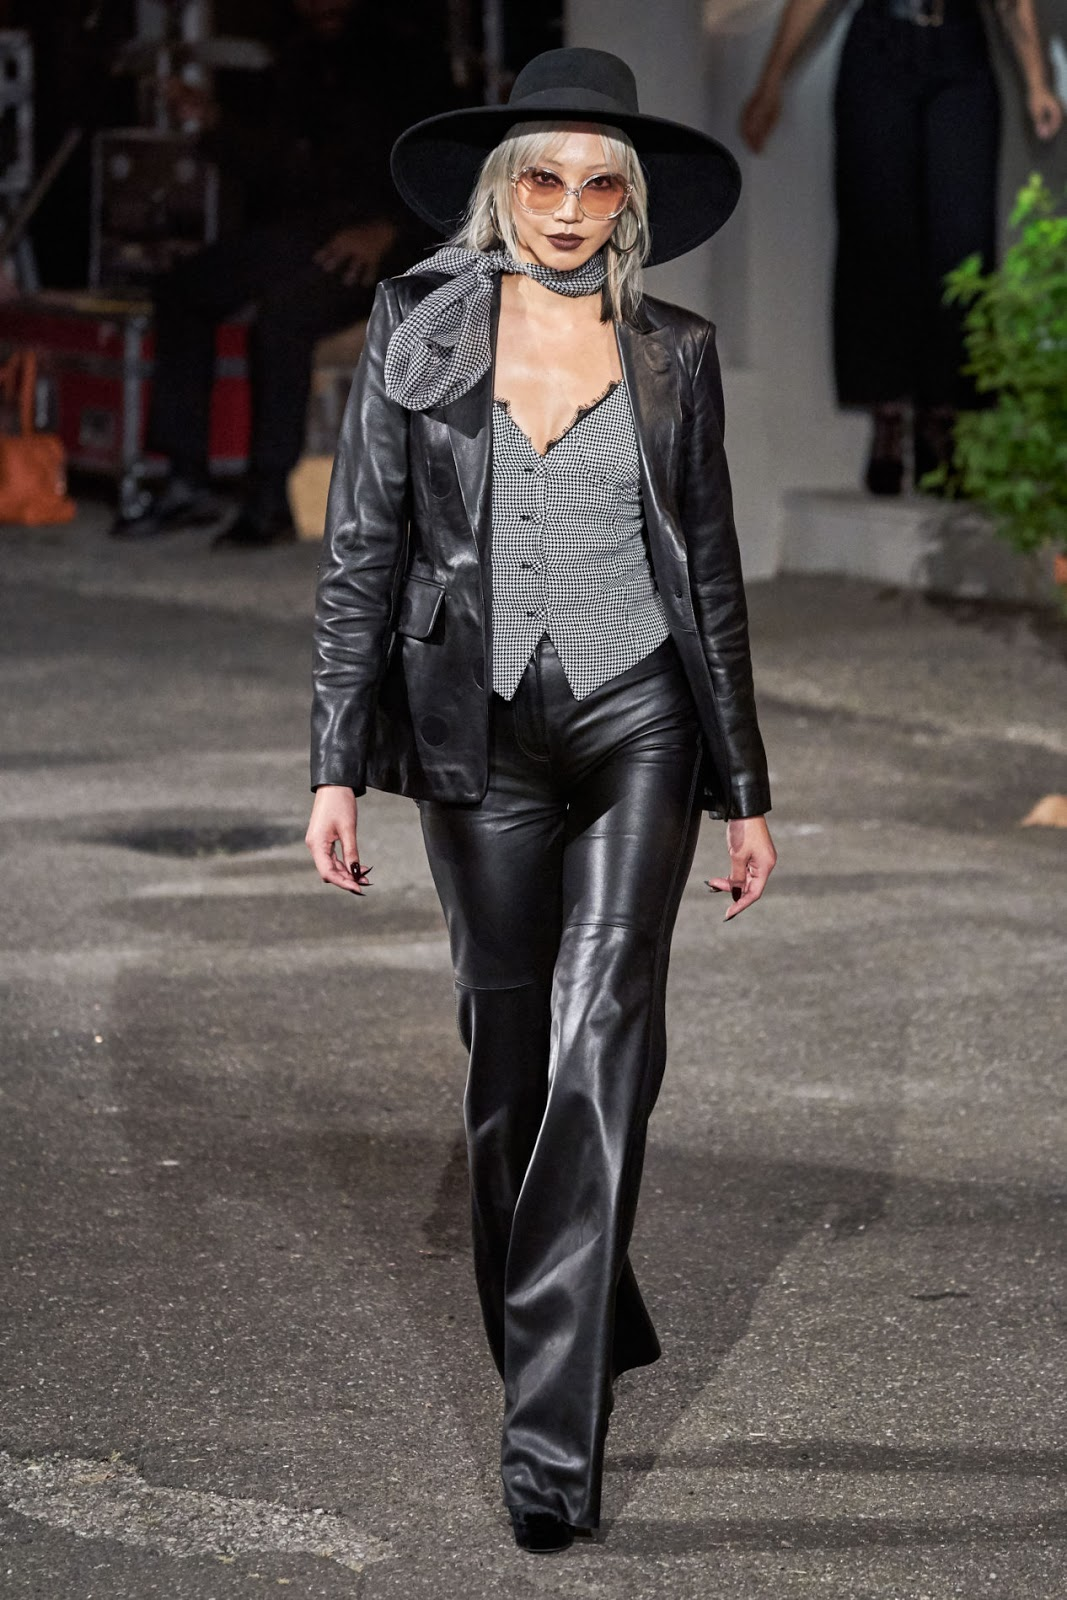 Zendaya x Tommy Hilfiger NYFW Show